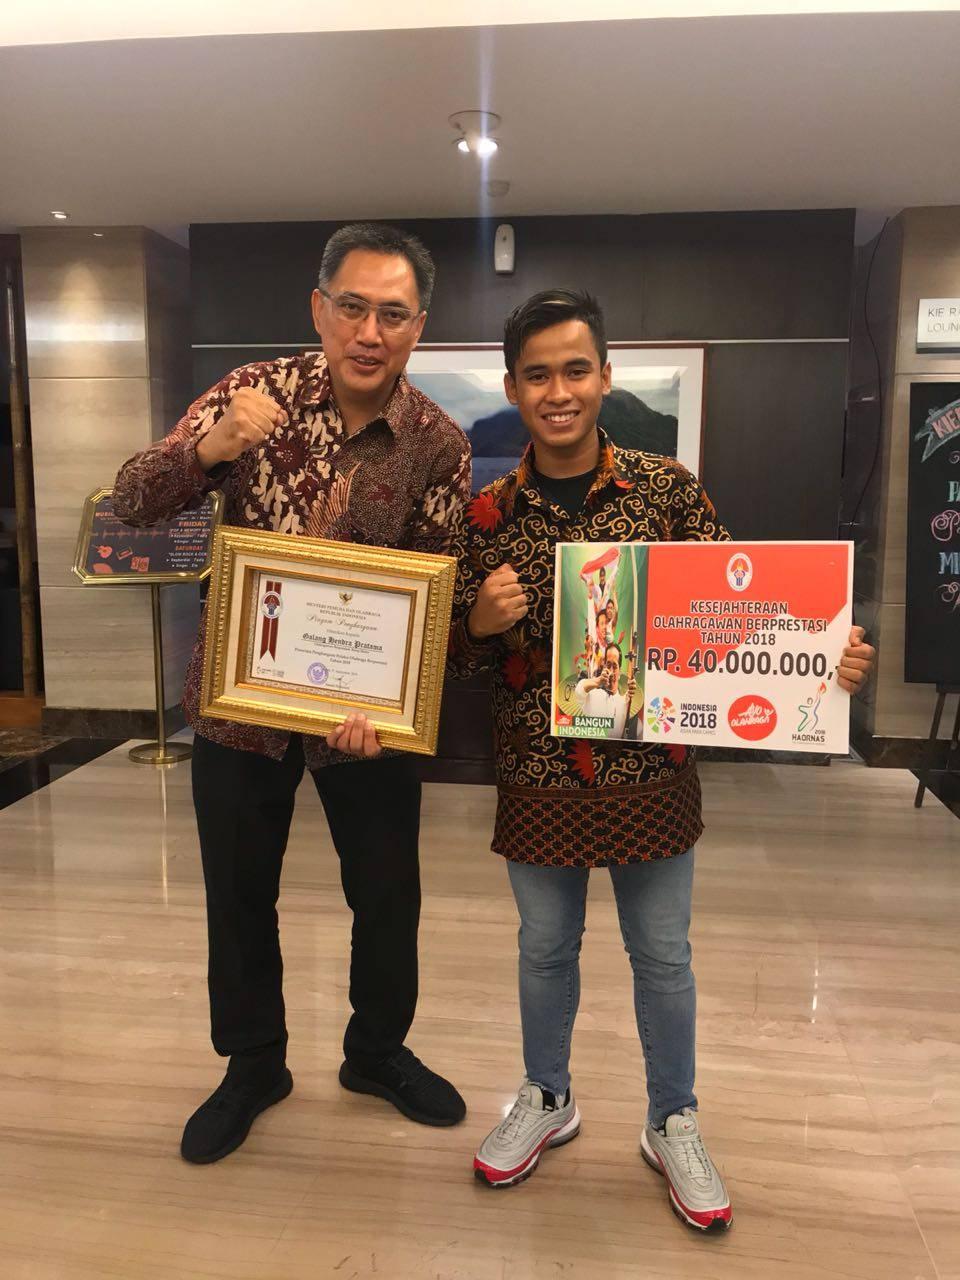 Galang Hendra bersama M.Abidin selaku GM After sales & Motor Sports PT YIMM